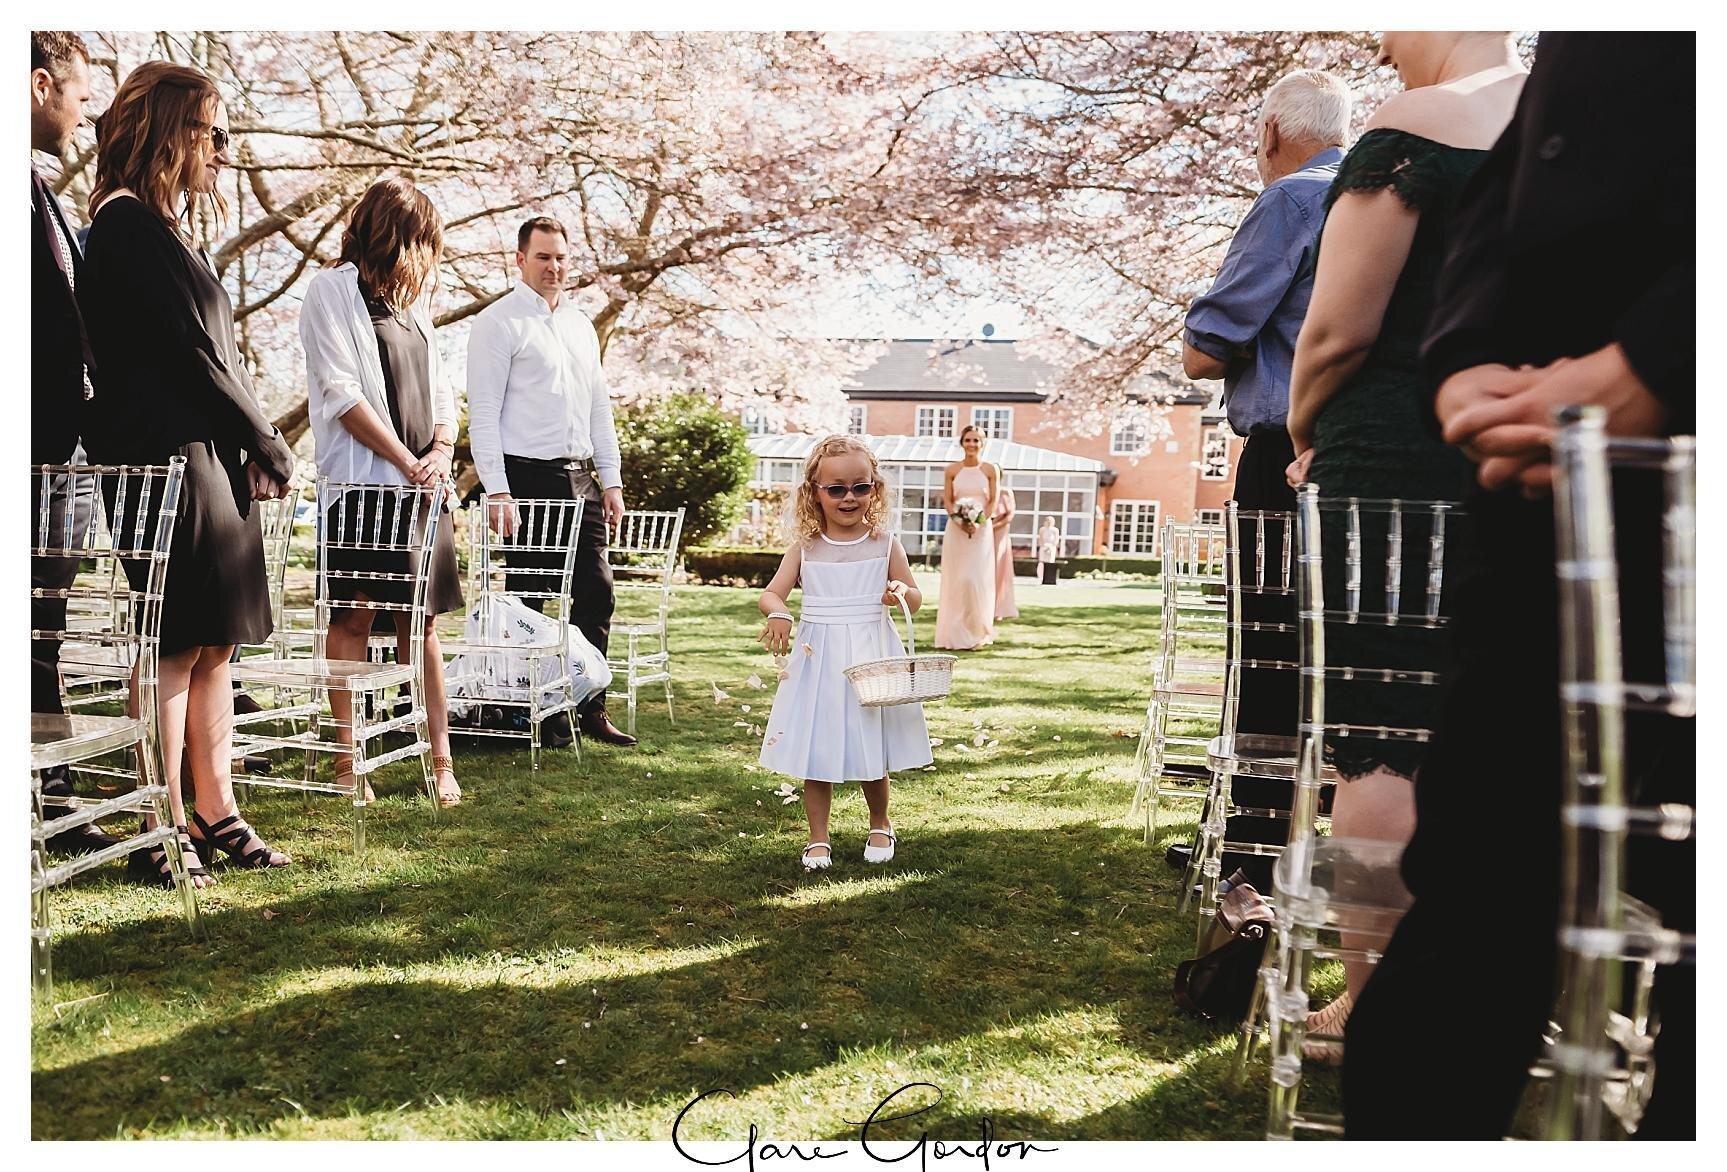 Henley-Hotel-Cherry-blossom-wedding-photos (40).jpg